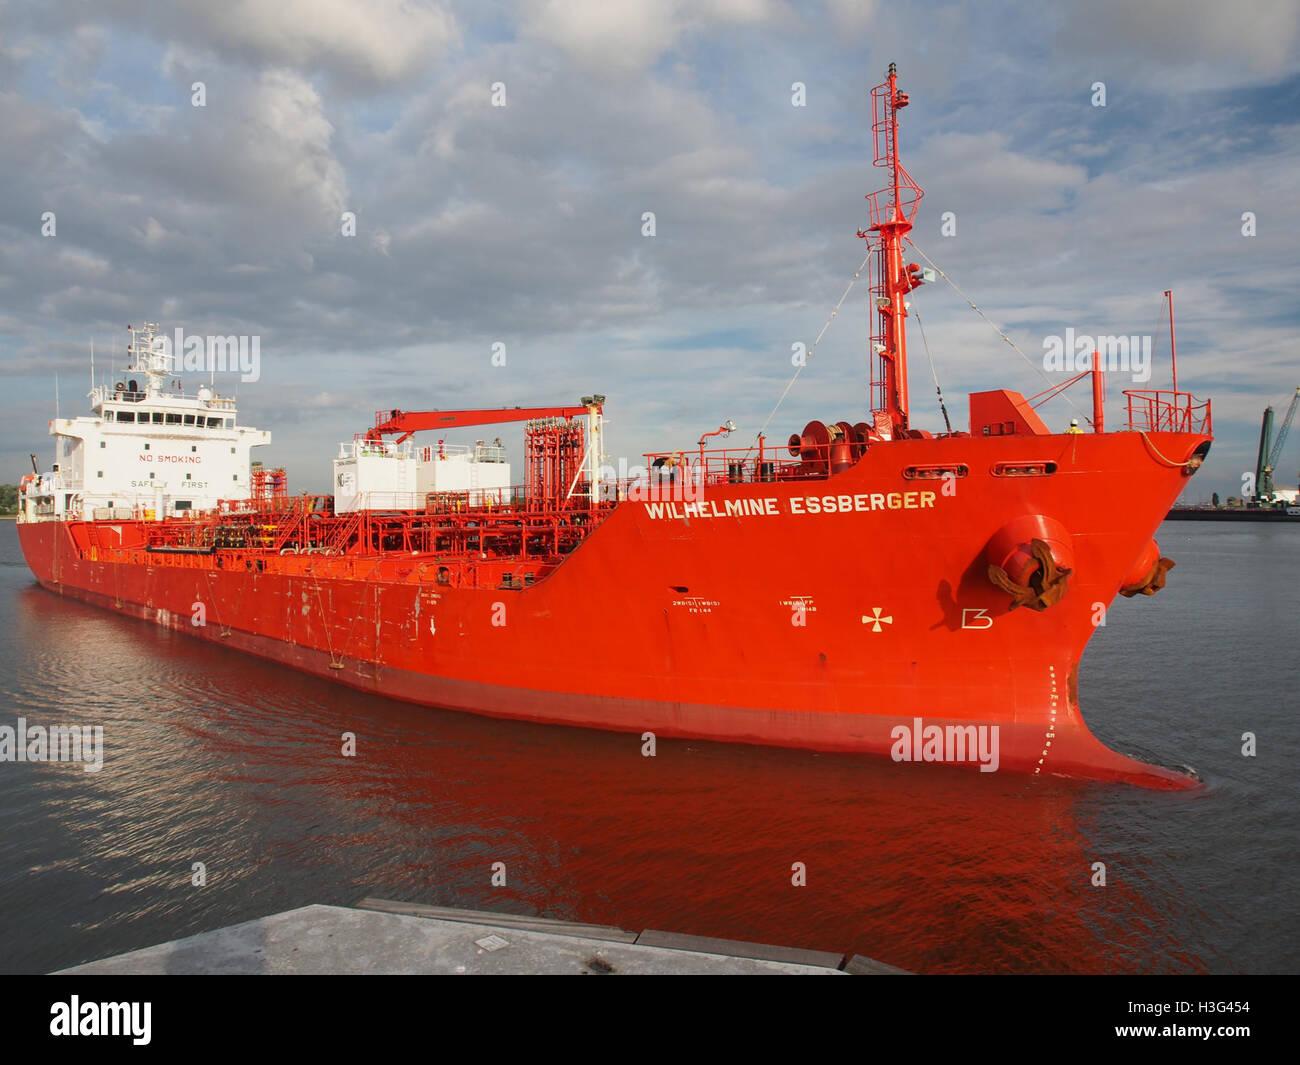 Wilhelmine Essberger (ship, 2005) IMO 9295440 Port of Antwerp pic3 - Stock Image